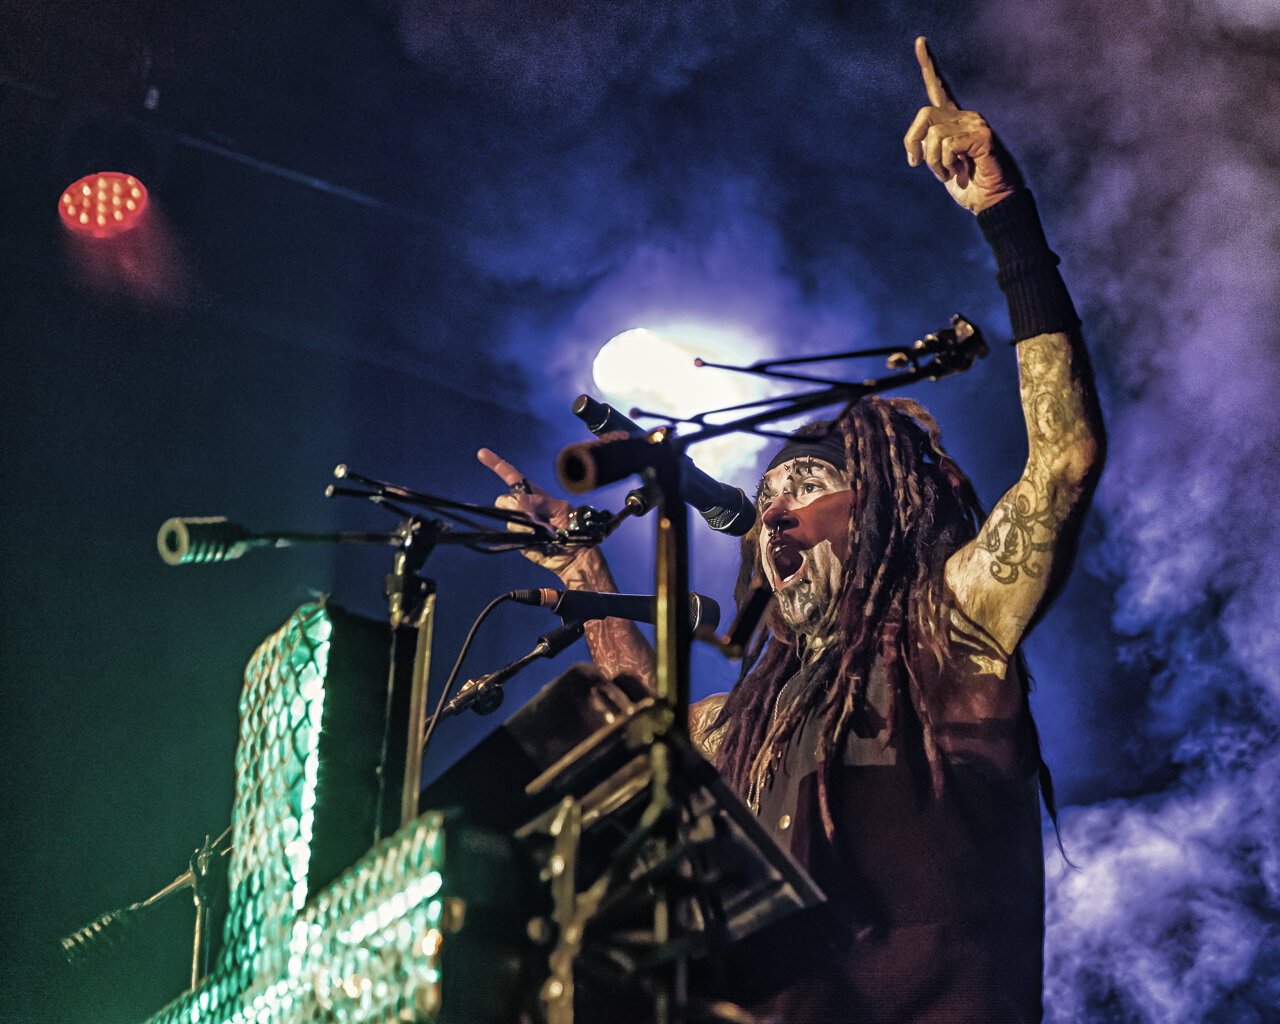 Ministry-VinylMusicHall-Pensacola-Nov012019-Raymer-001.jpg